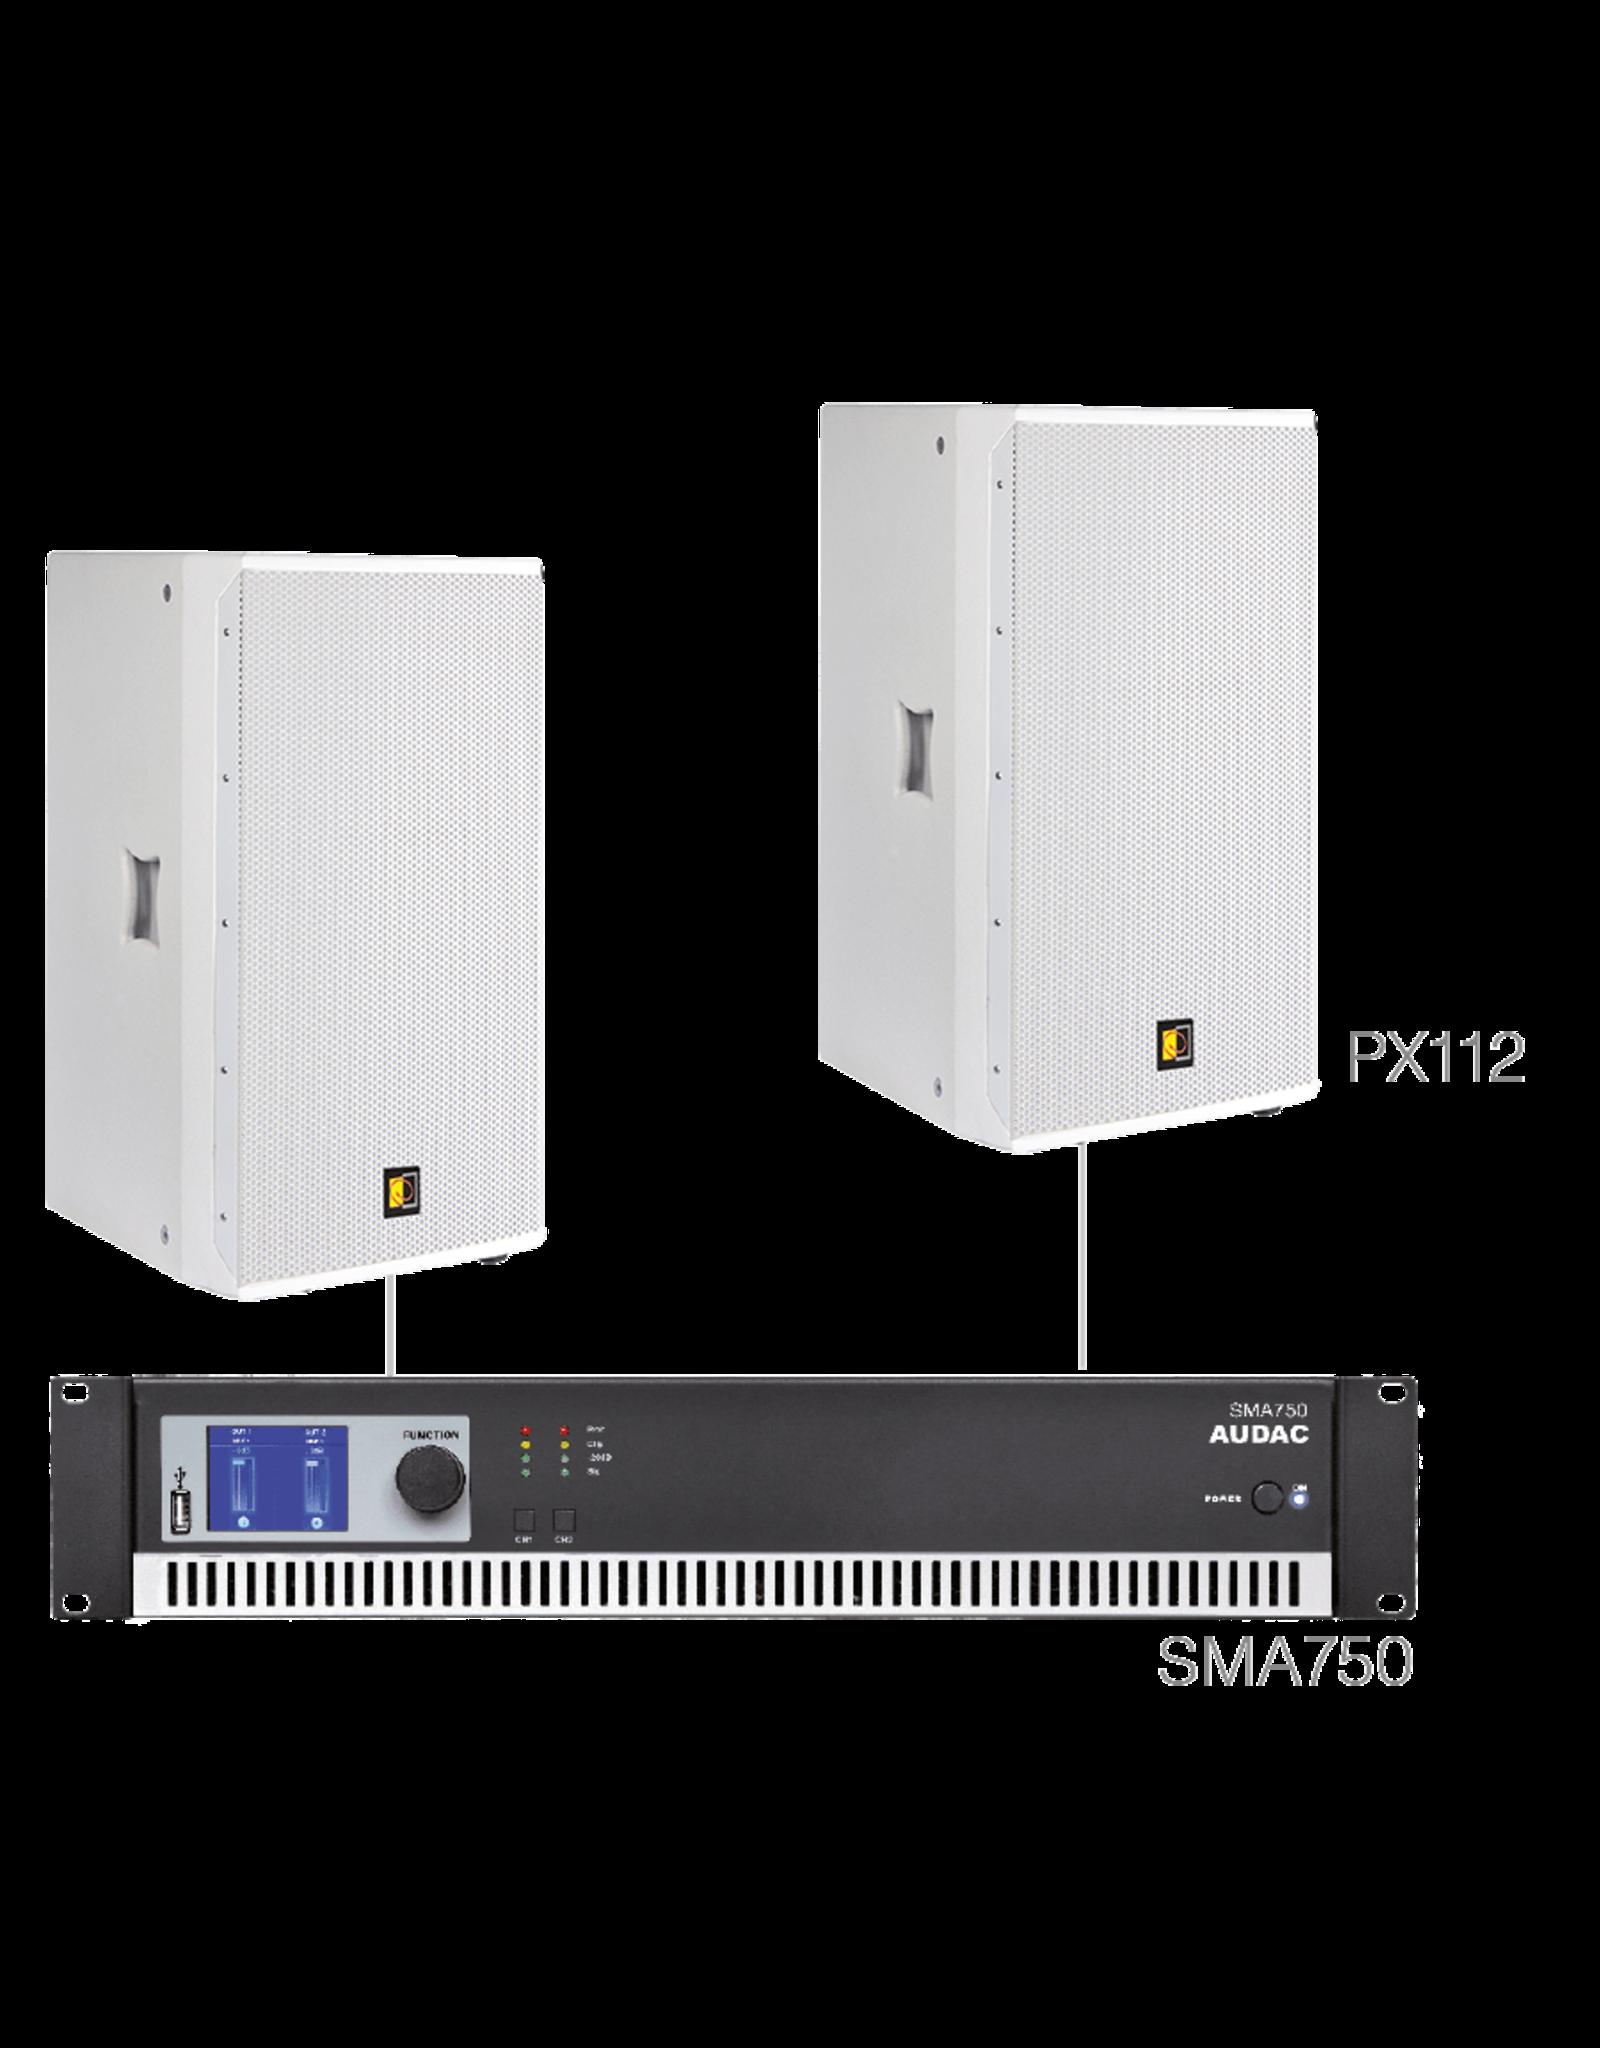 Audac 2 x PX112 + SMA750 White version